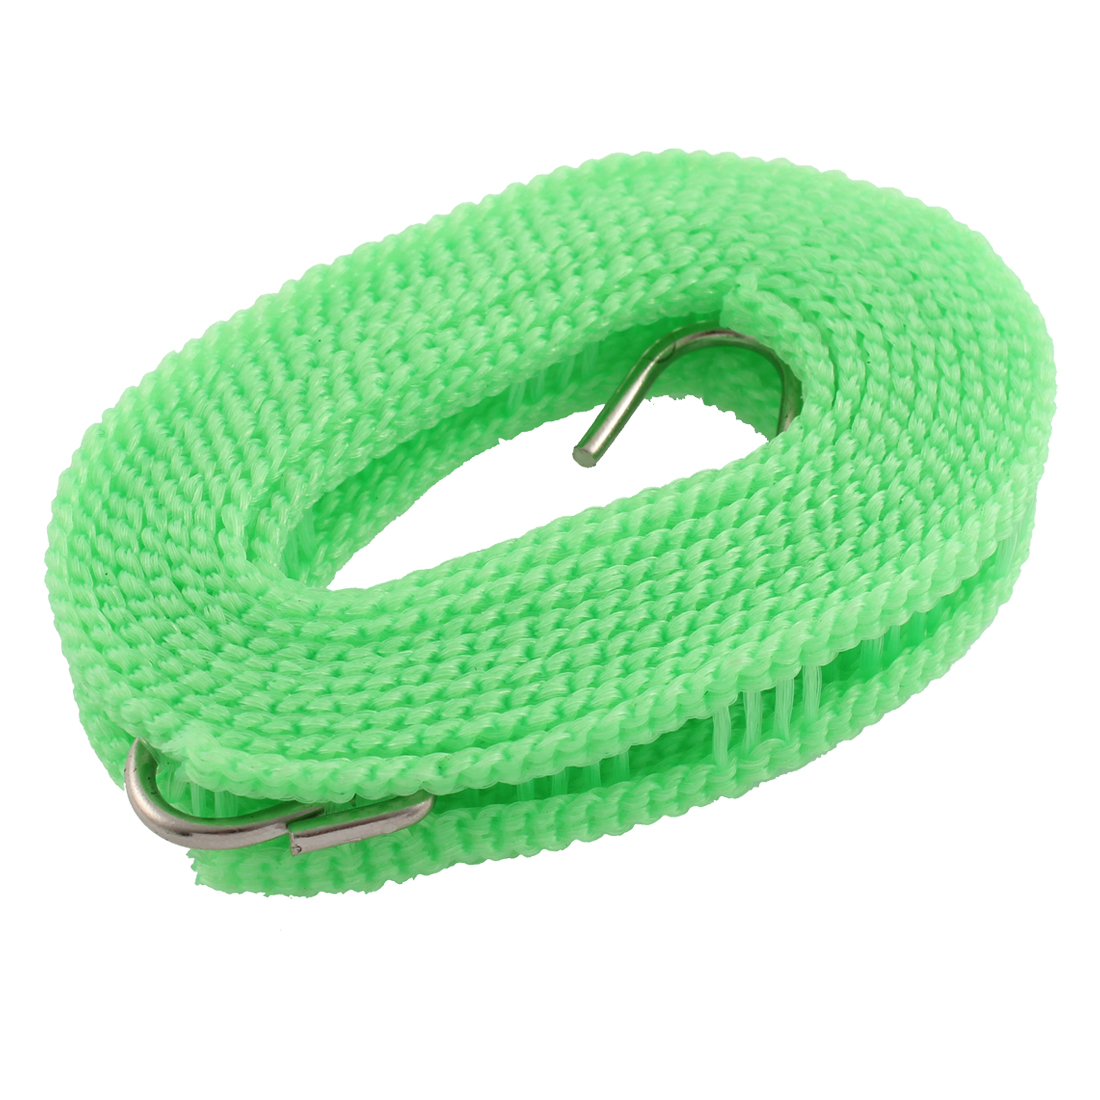 Outdoor Green Nylon Nonslip 2 Hooks Windproof Clothesline Rope Hanger 2M